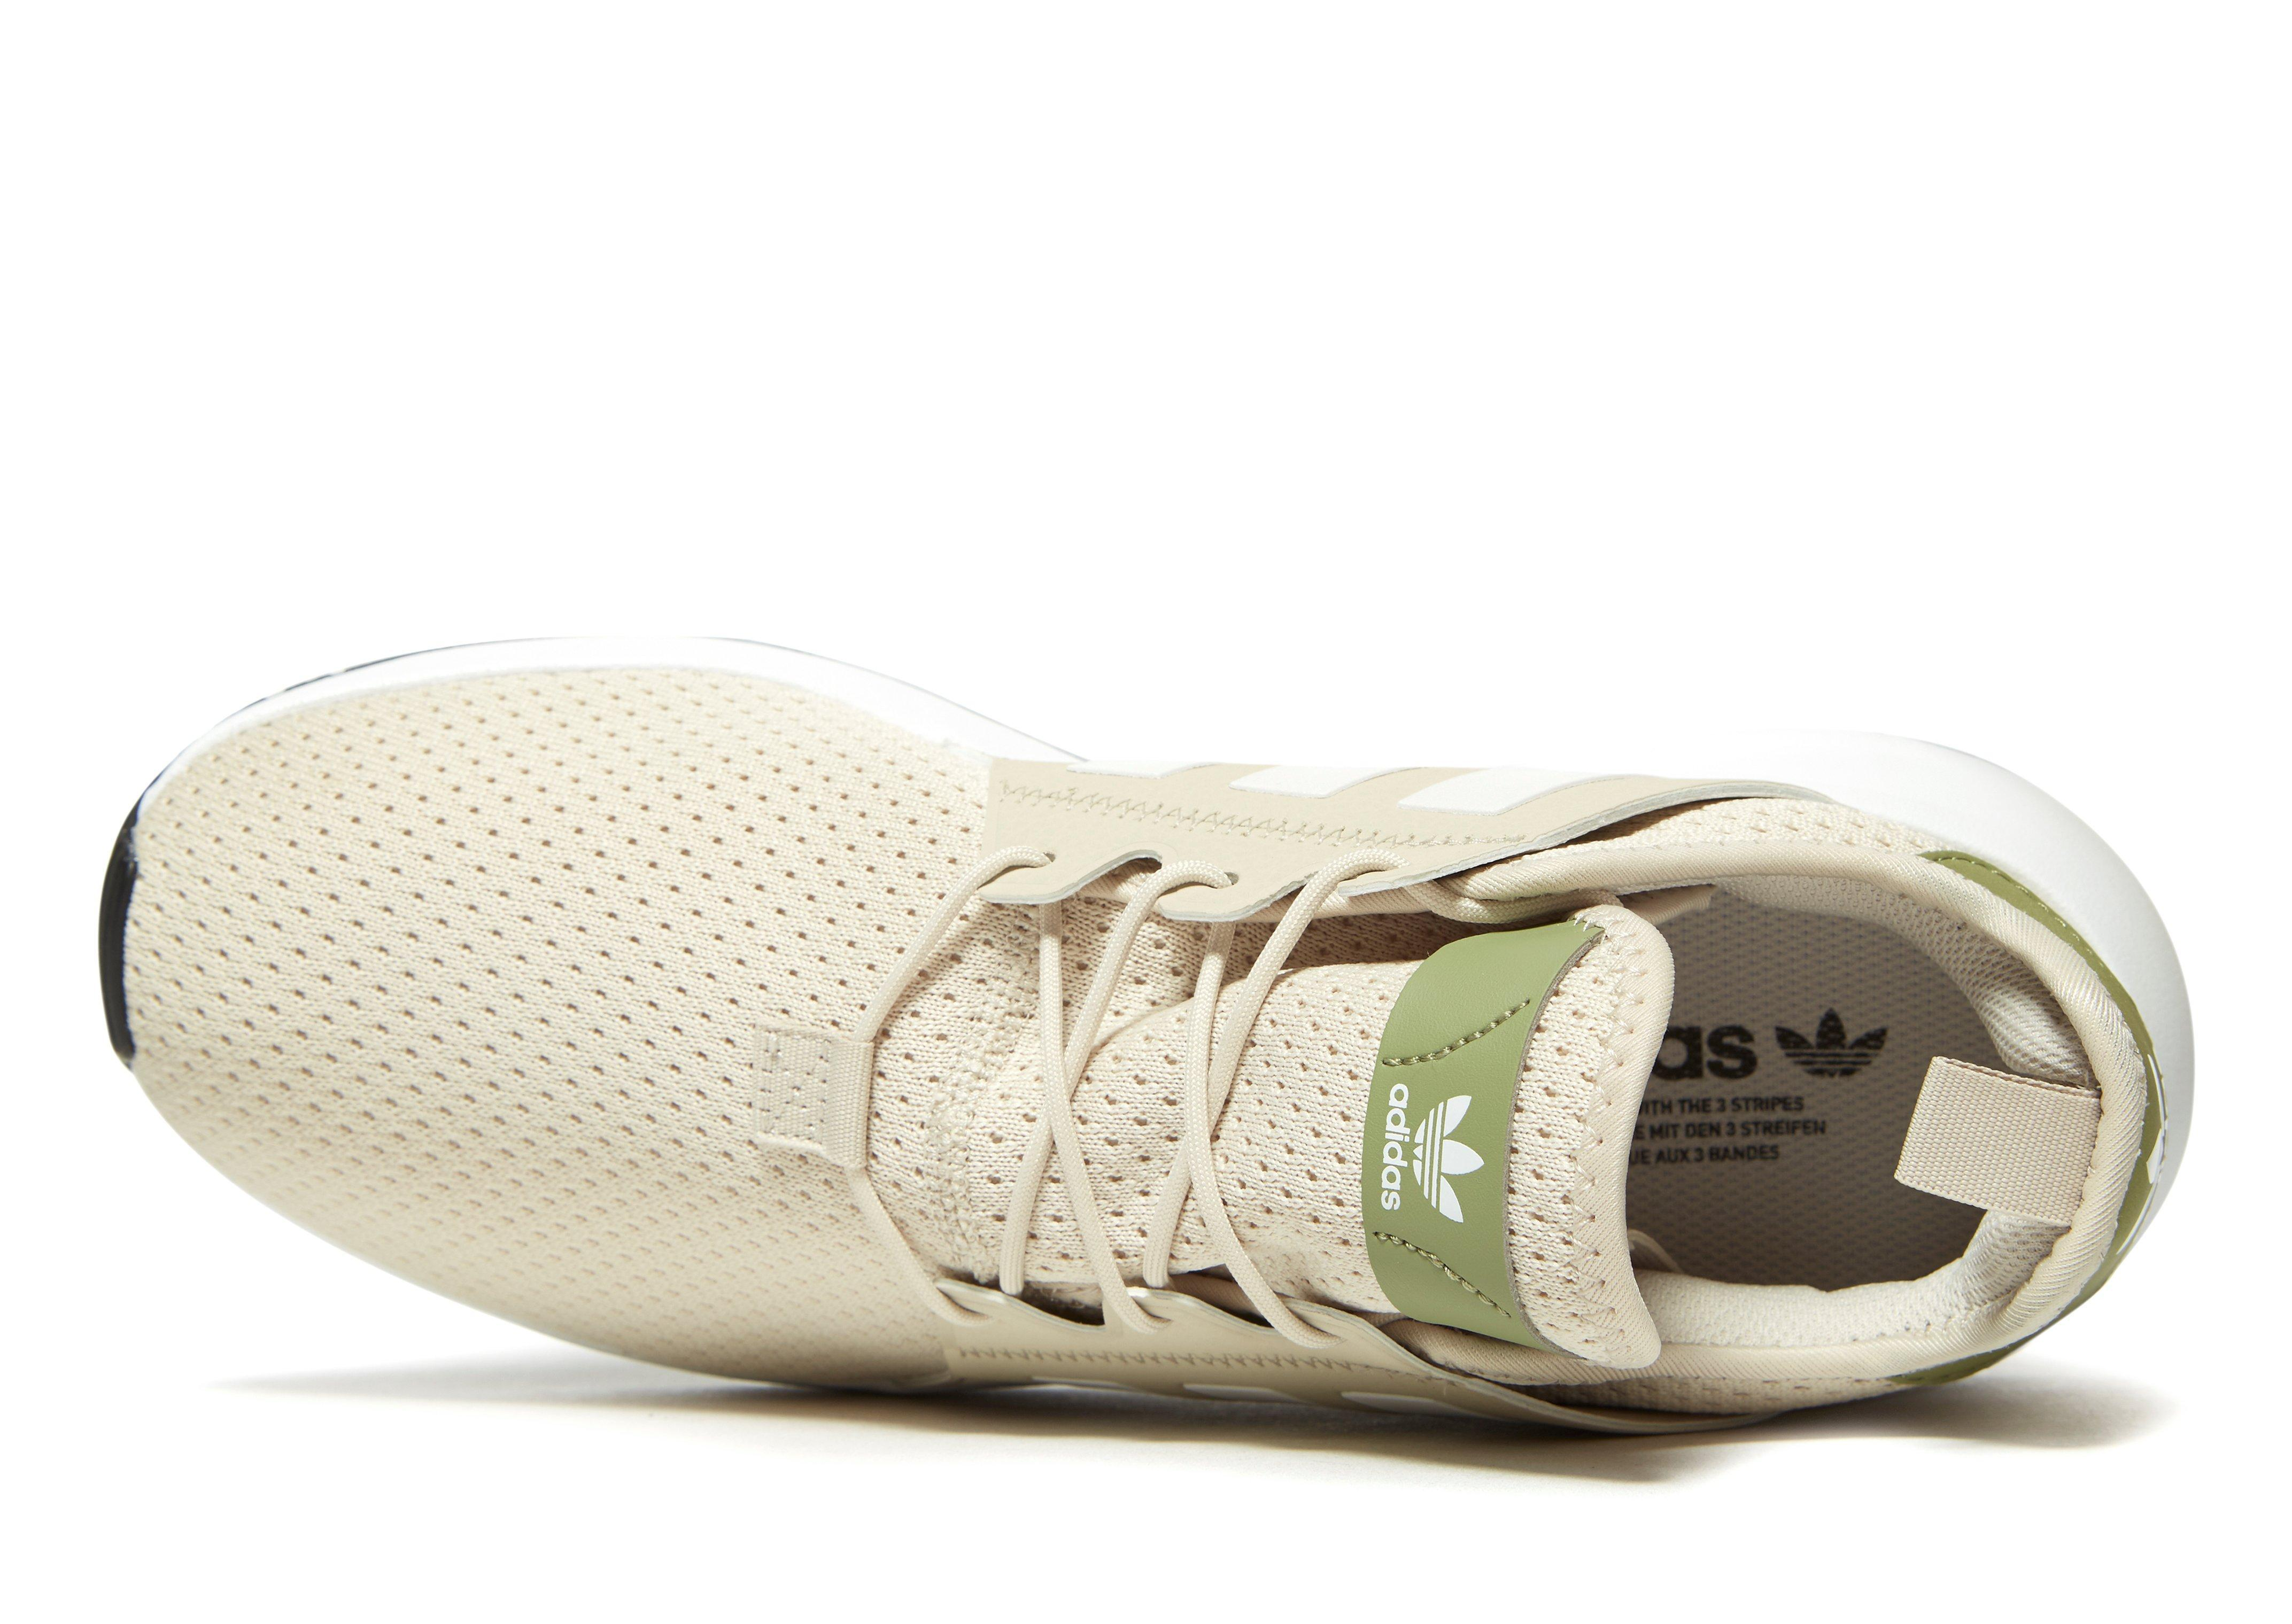 adidas scarpe xplr bb1099 pagina 4 daftar aggiornare harga terbaru